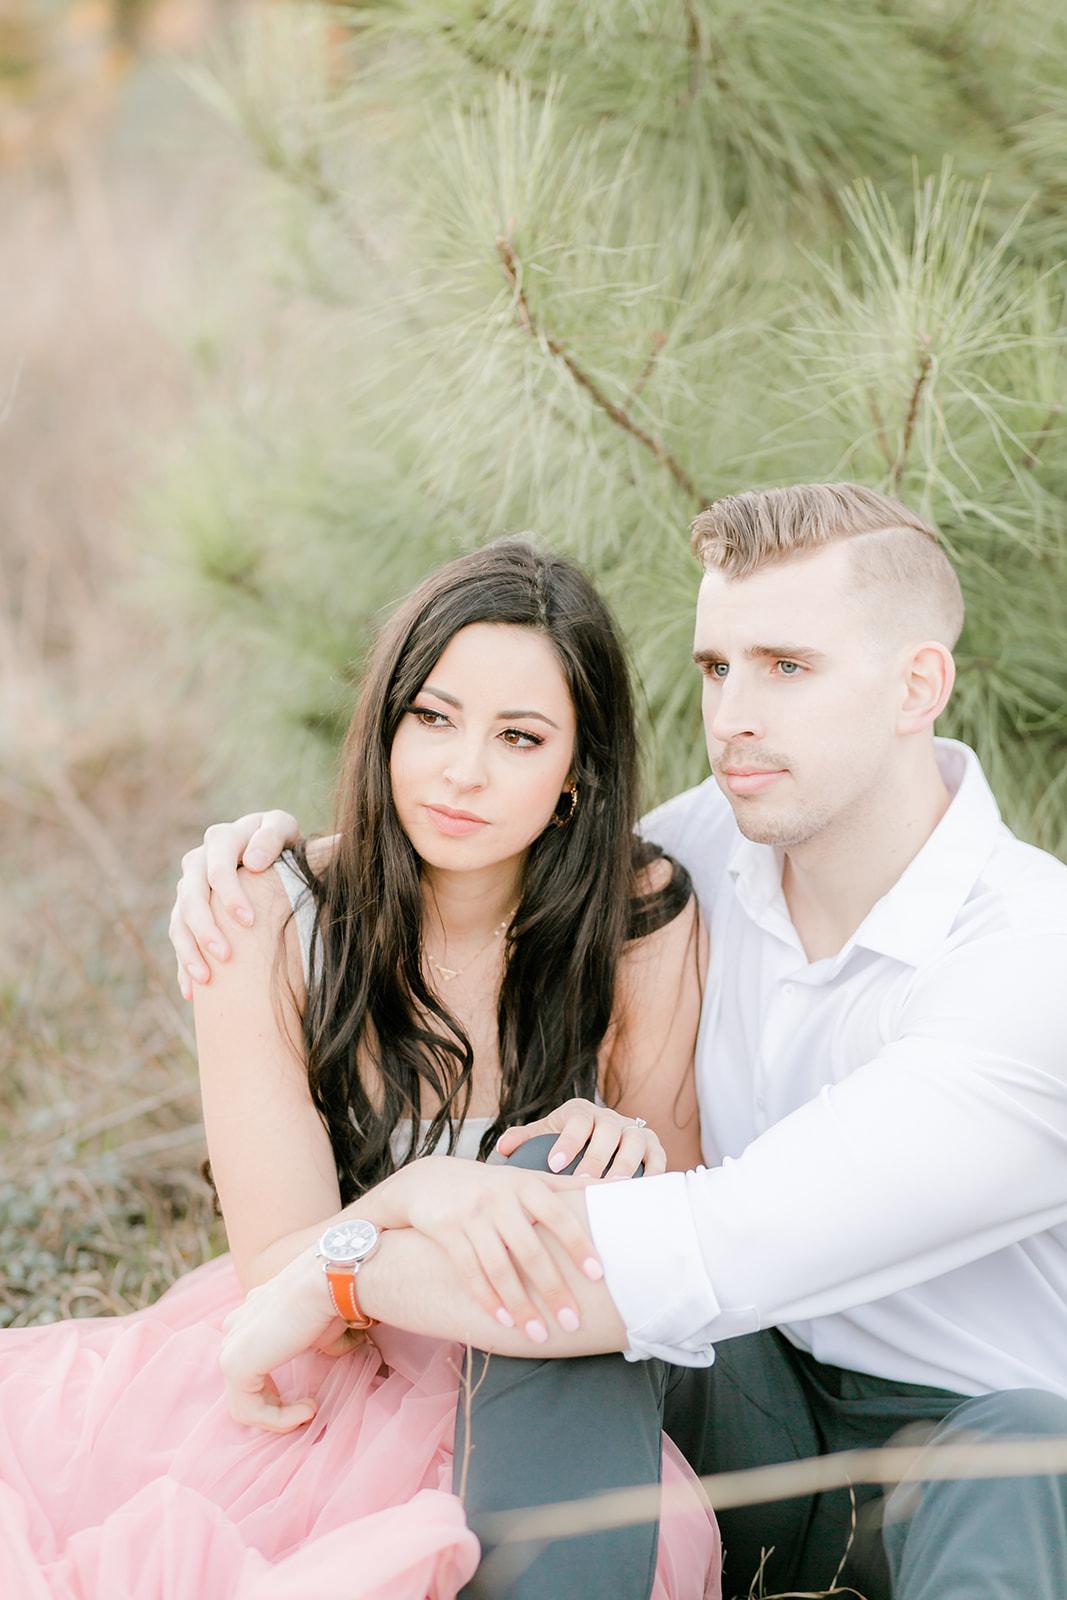 Aisle Society- Alex + Patton's Engagement